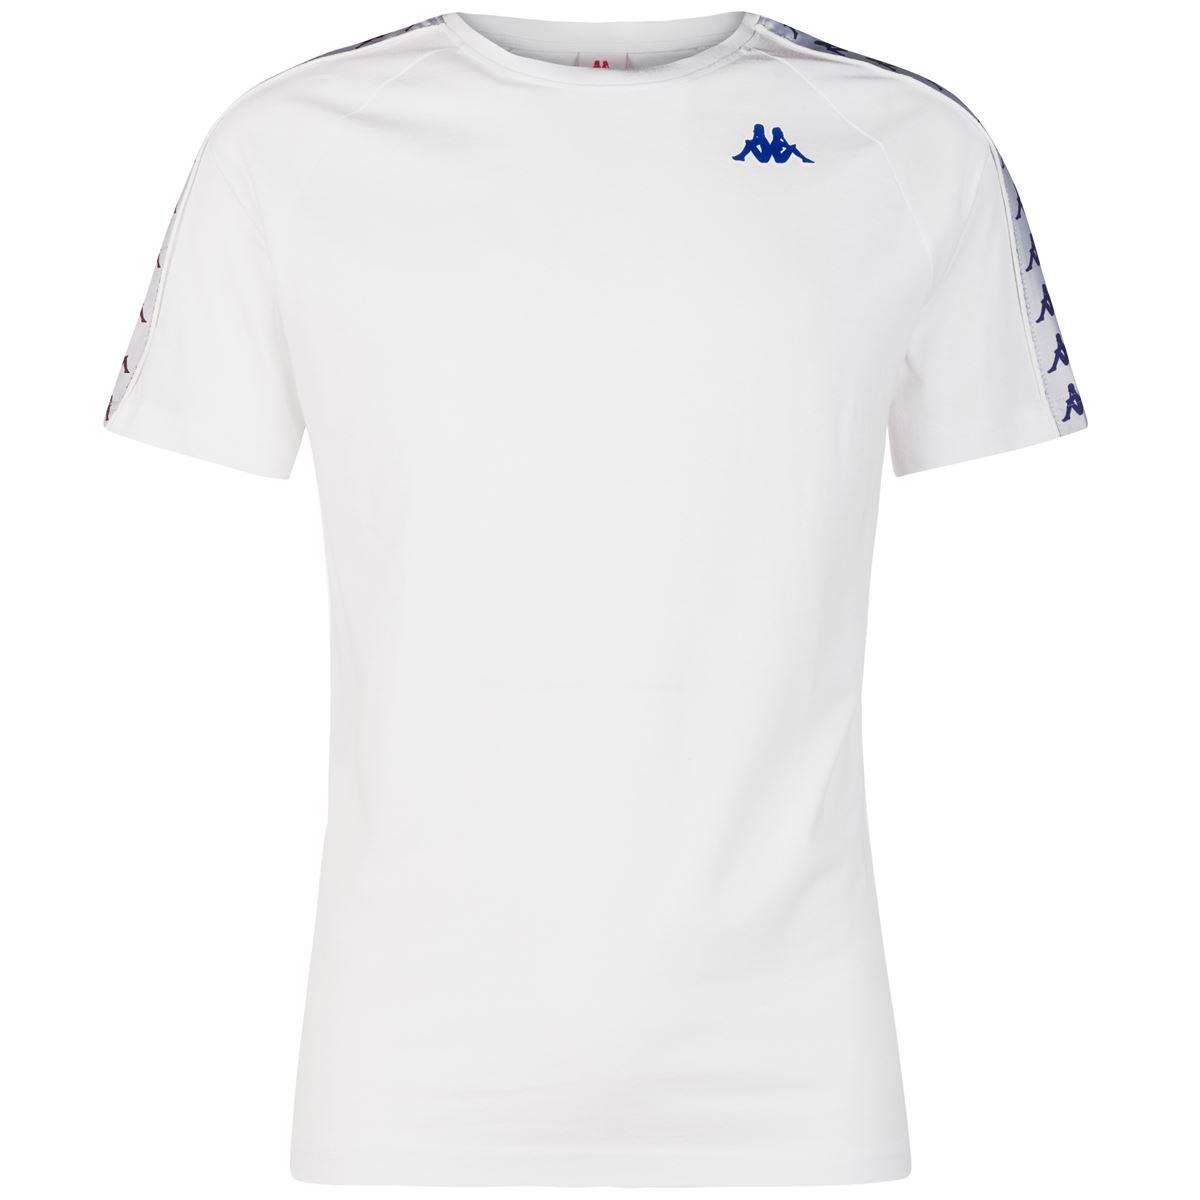 T-shirt girocollo da uomo in jersey Kappa | T-shirt | 303UV10A63 WHITE-VIOLET-BLUE